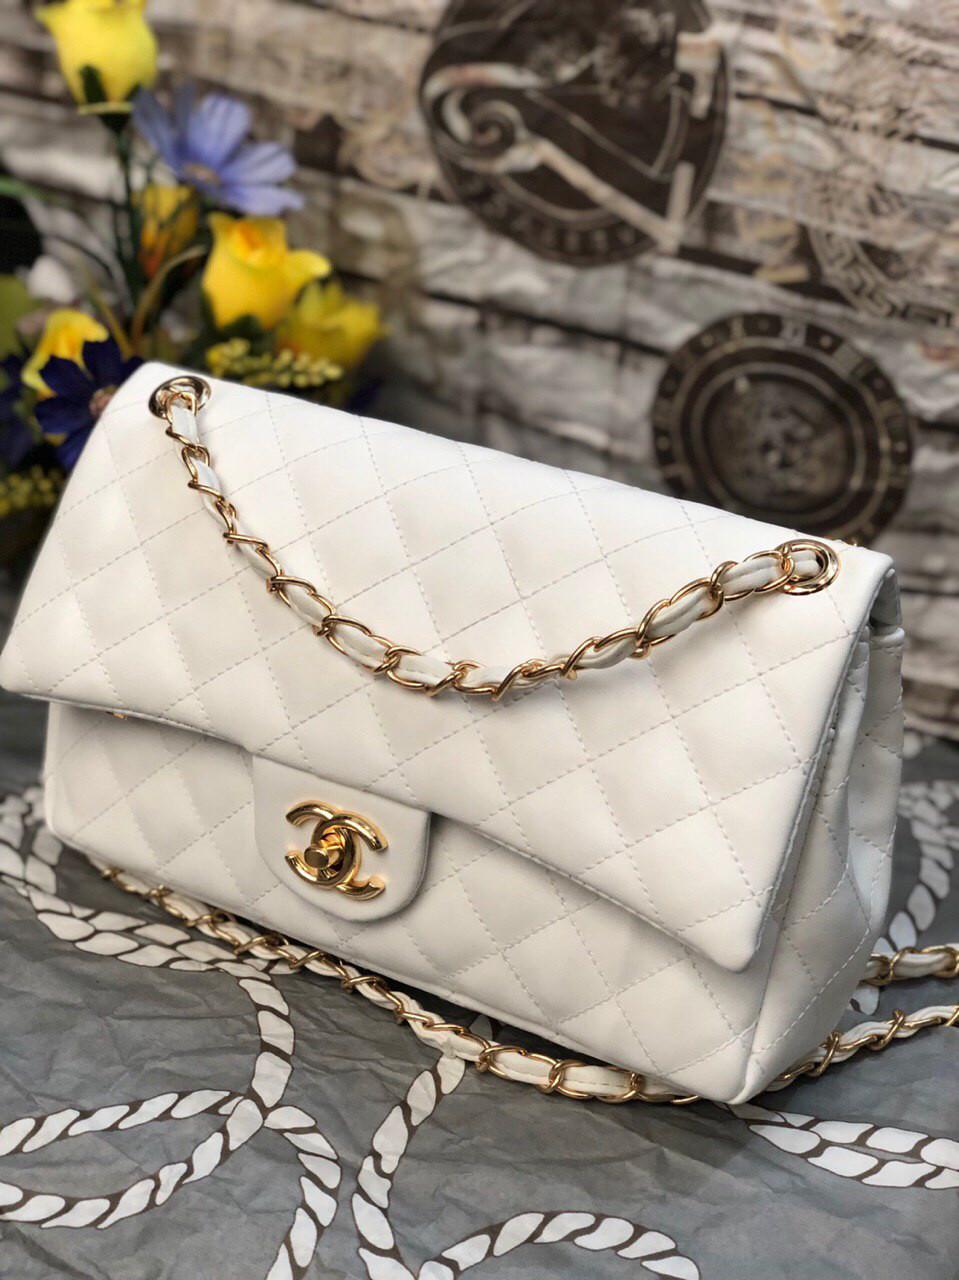 Сумка женская Chanel Шанель реплика саквояж, white